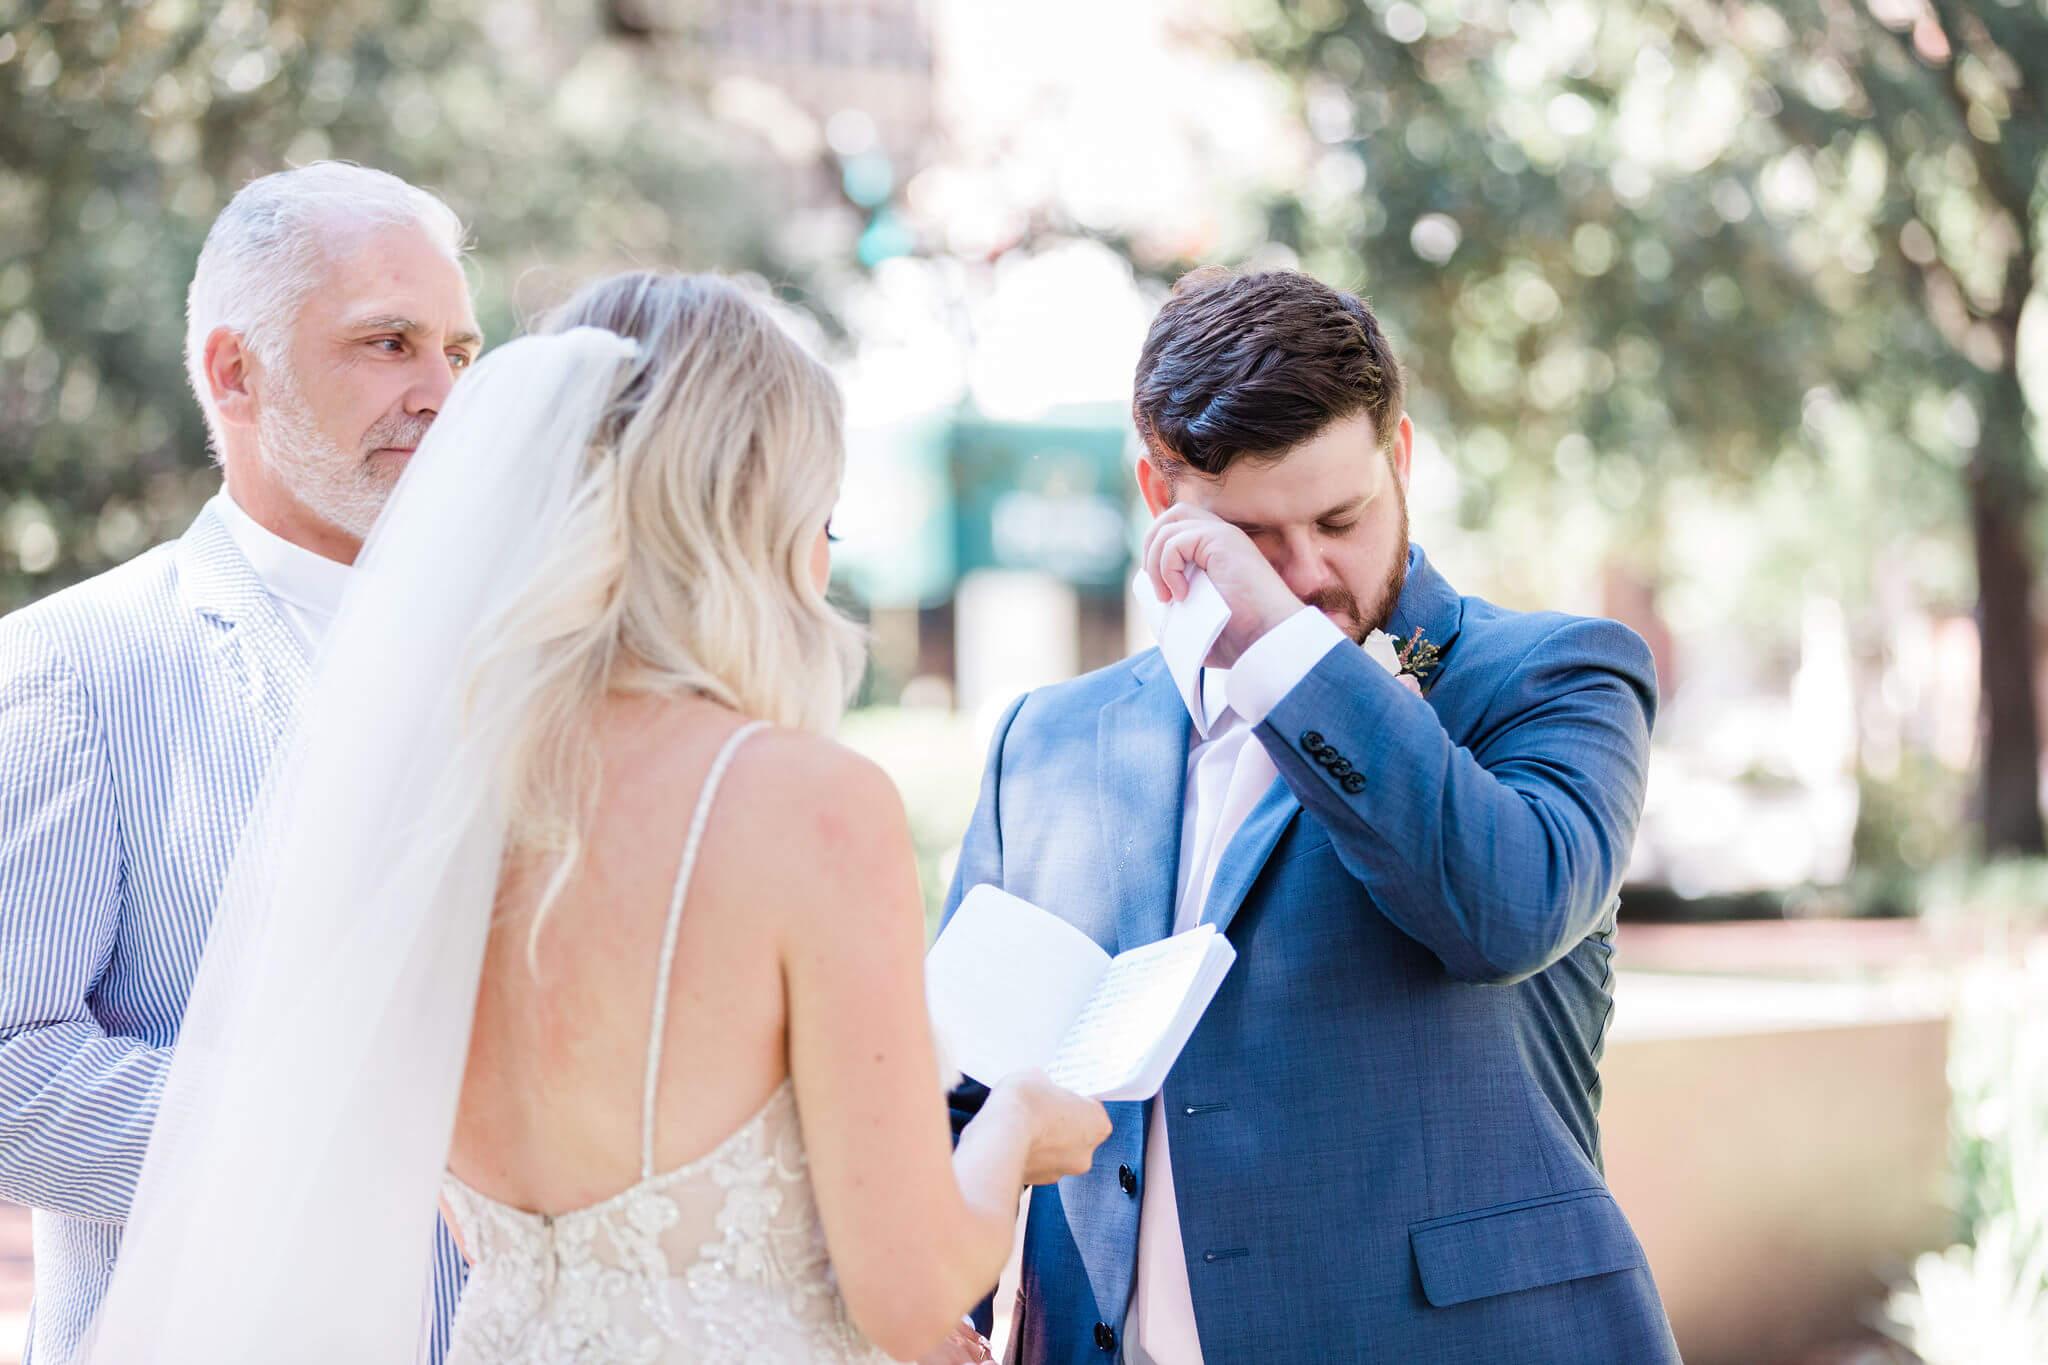 apt-b-photography-savannah-wedding-photographer-savannah-wedding-savannah-elopement-intimate-wedding-photographer-3.jpg